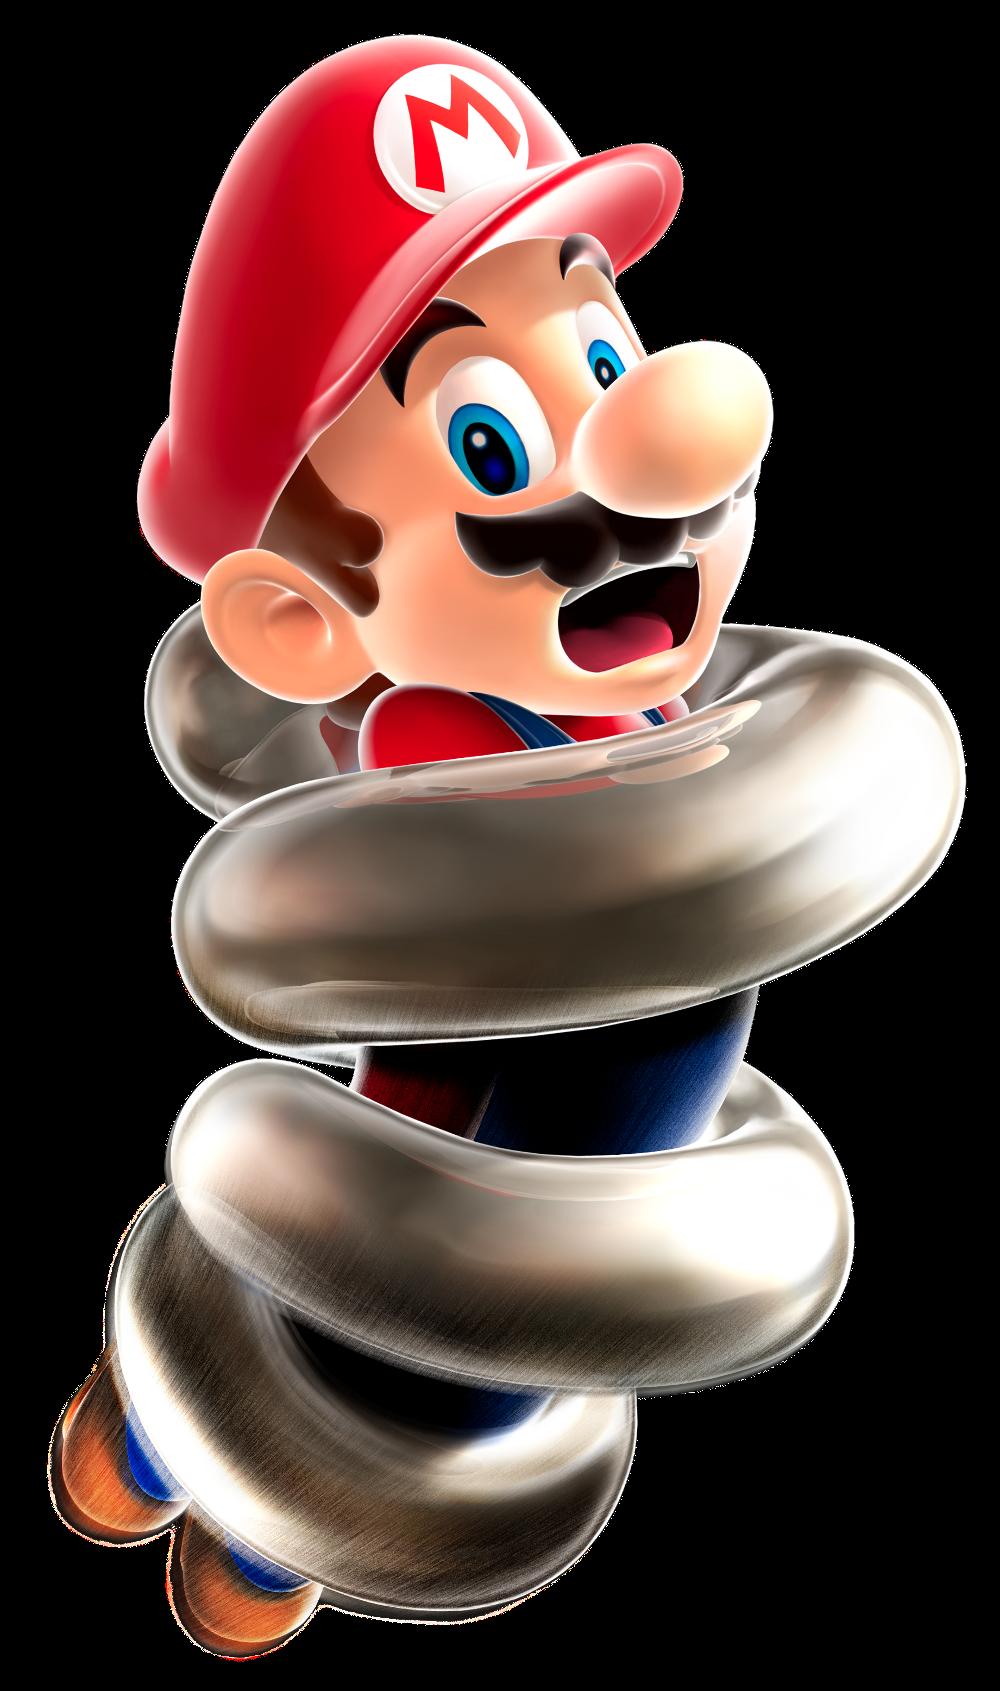 Spring Mario | Nintendo | FANDOM powered by Wikia